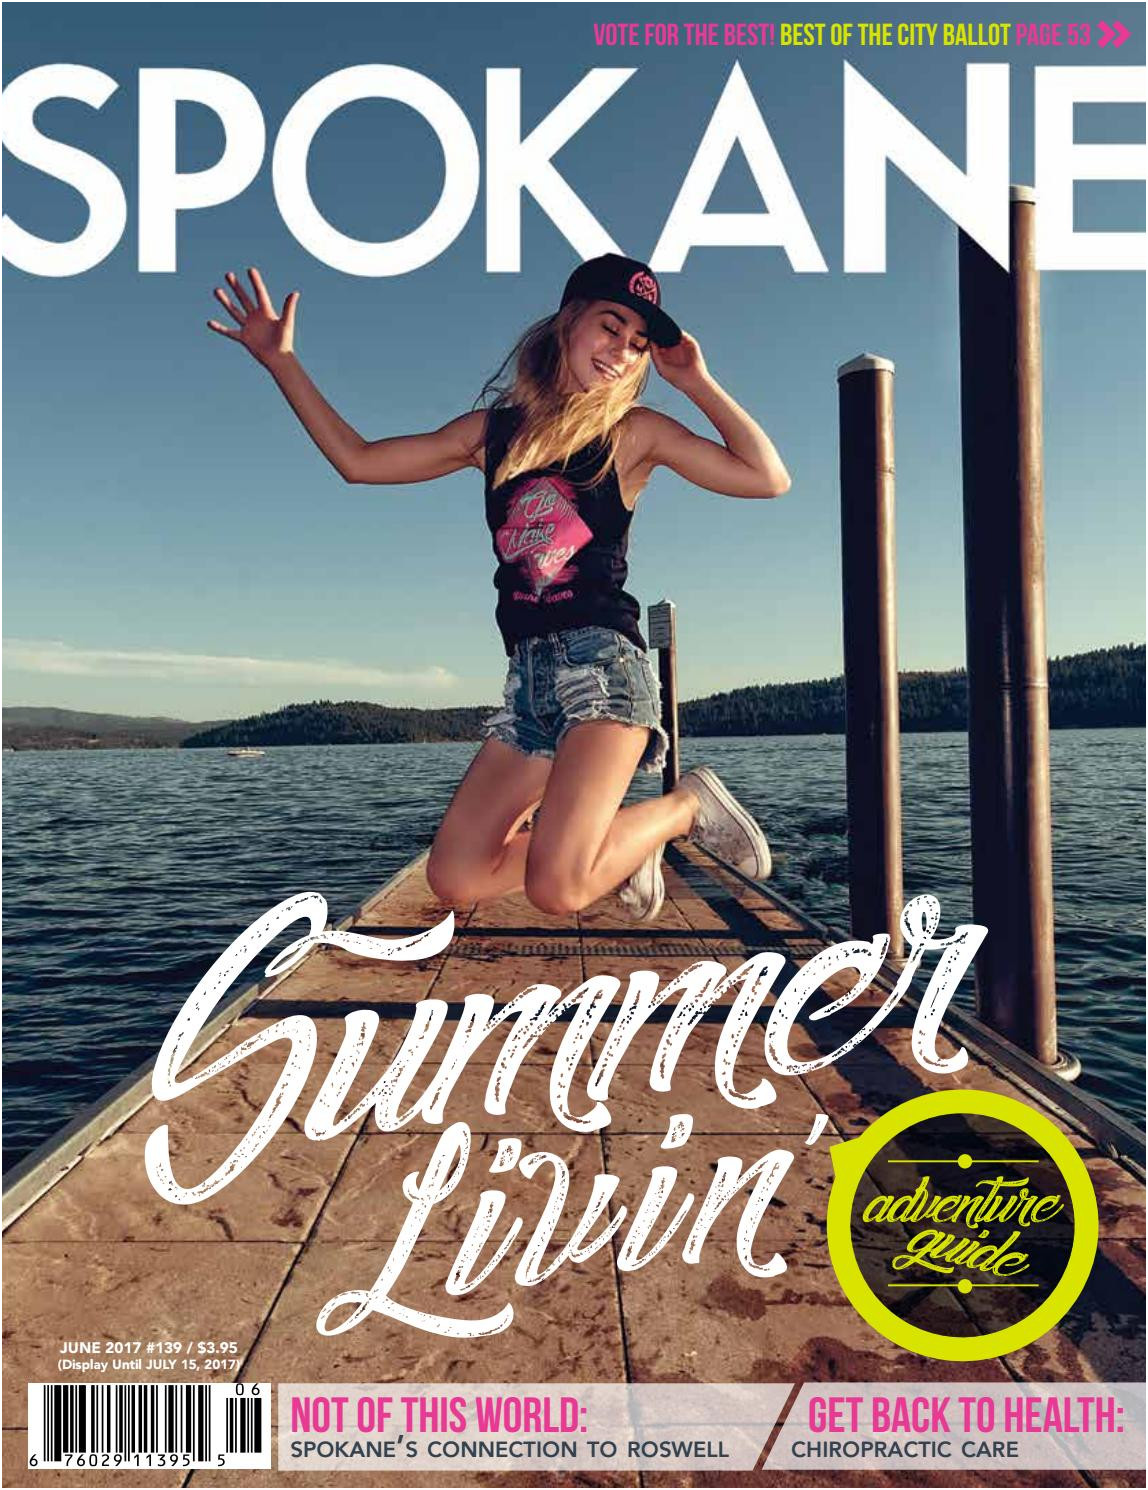 Jewelry Design Center Spokane Washington Beautiful Spokane Cda Living June 2017 139 by Spokane Magazine issuu